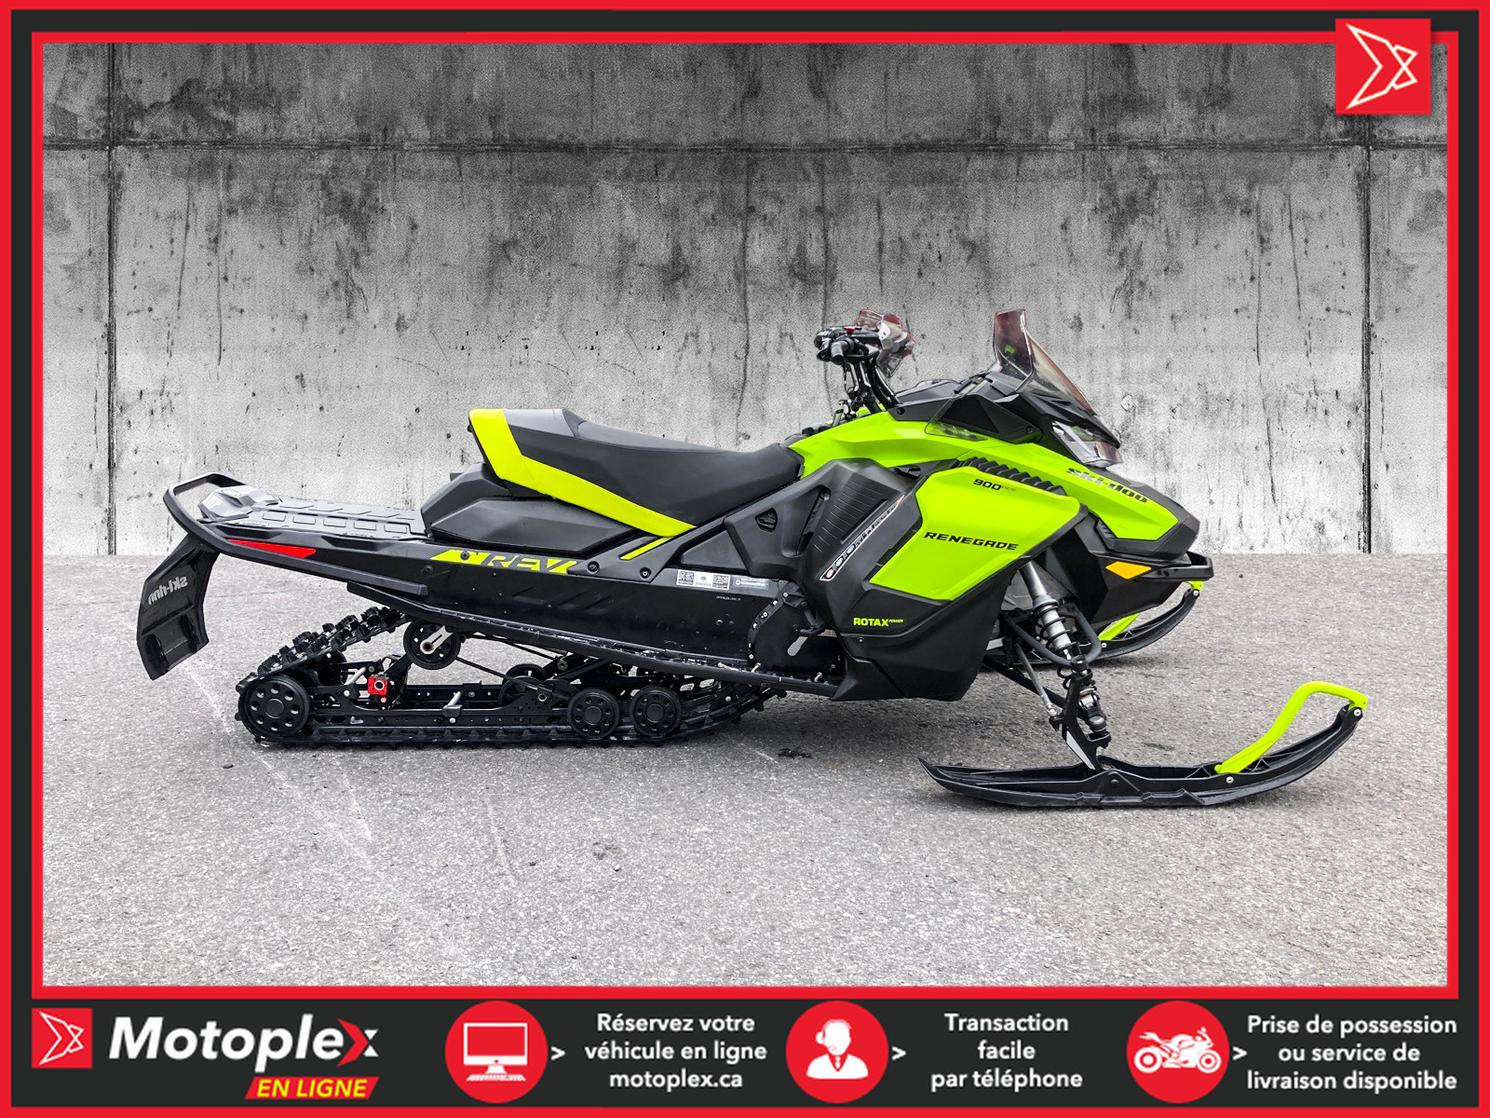 2020 Ski-Doo RENEGADE 900 ACE 53$/semaine